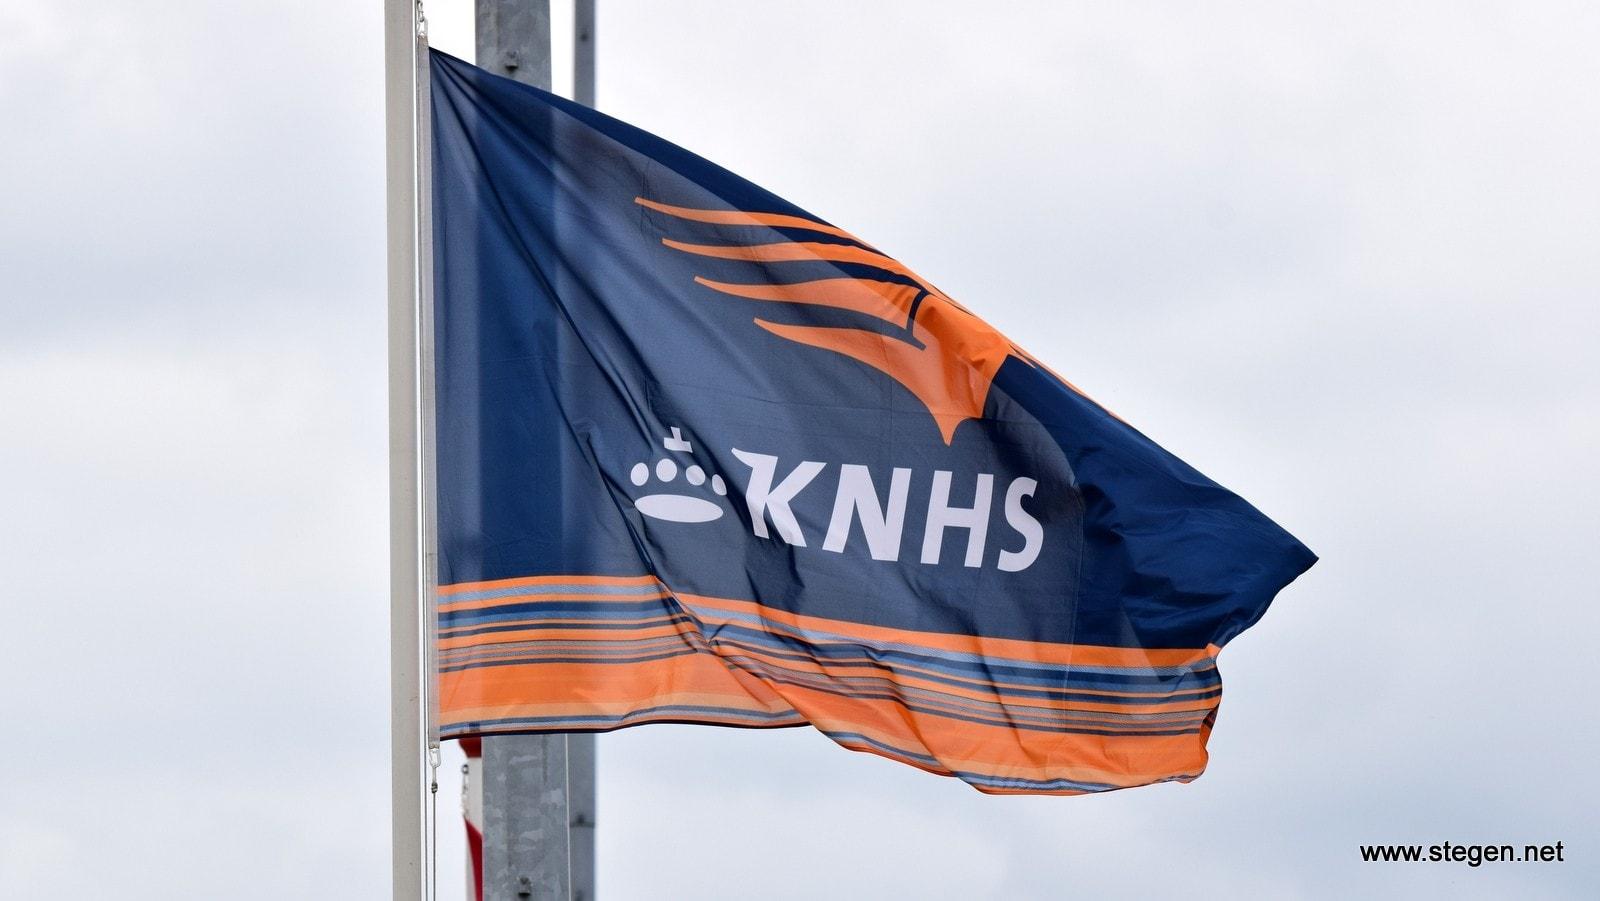 KNHS stelt Gerard Arkema aan als manager wedstrijdsport